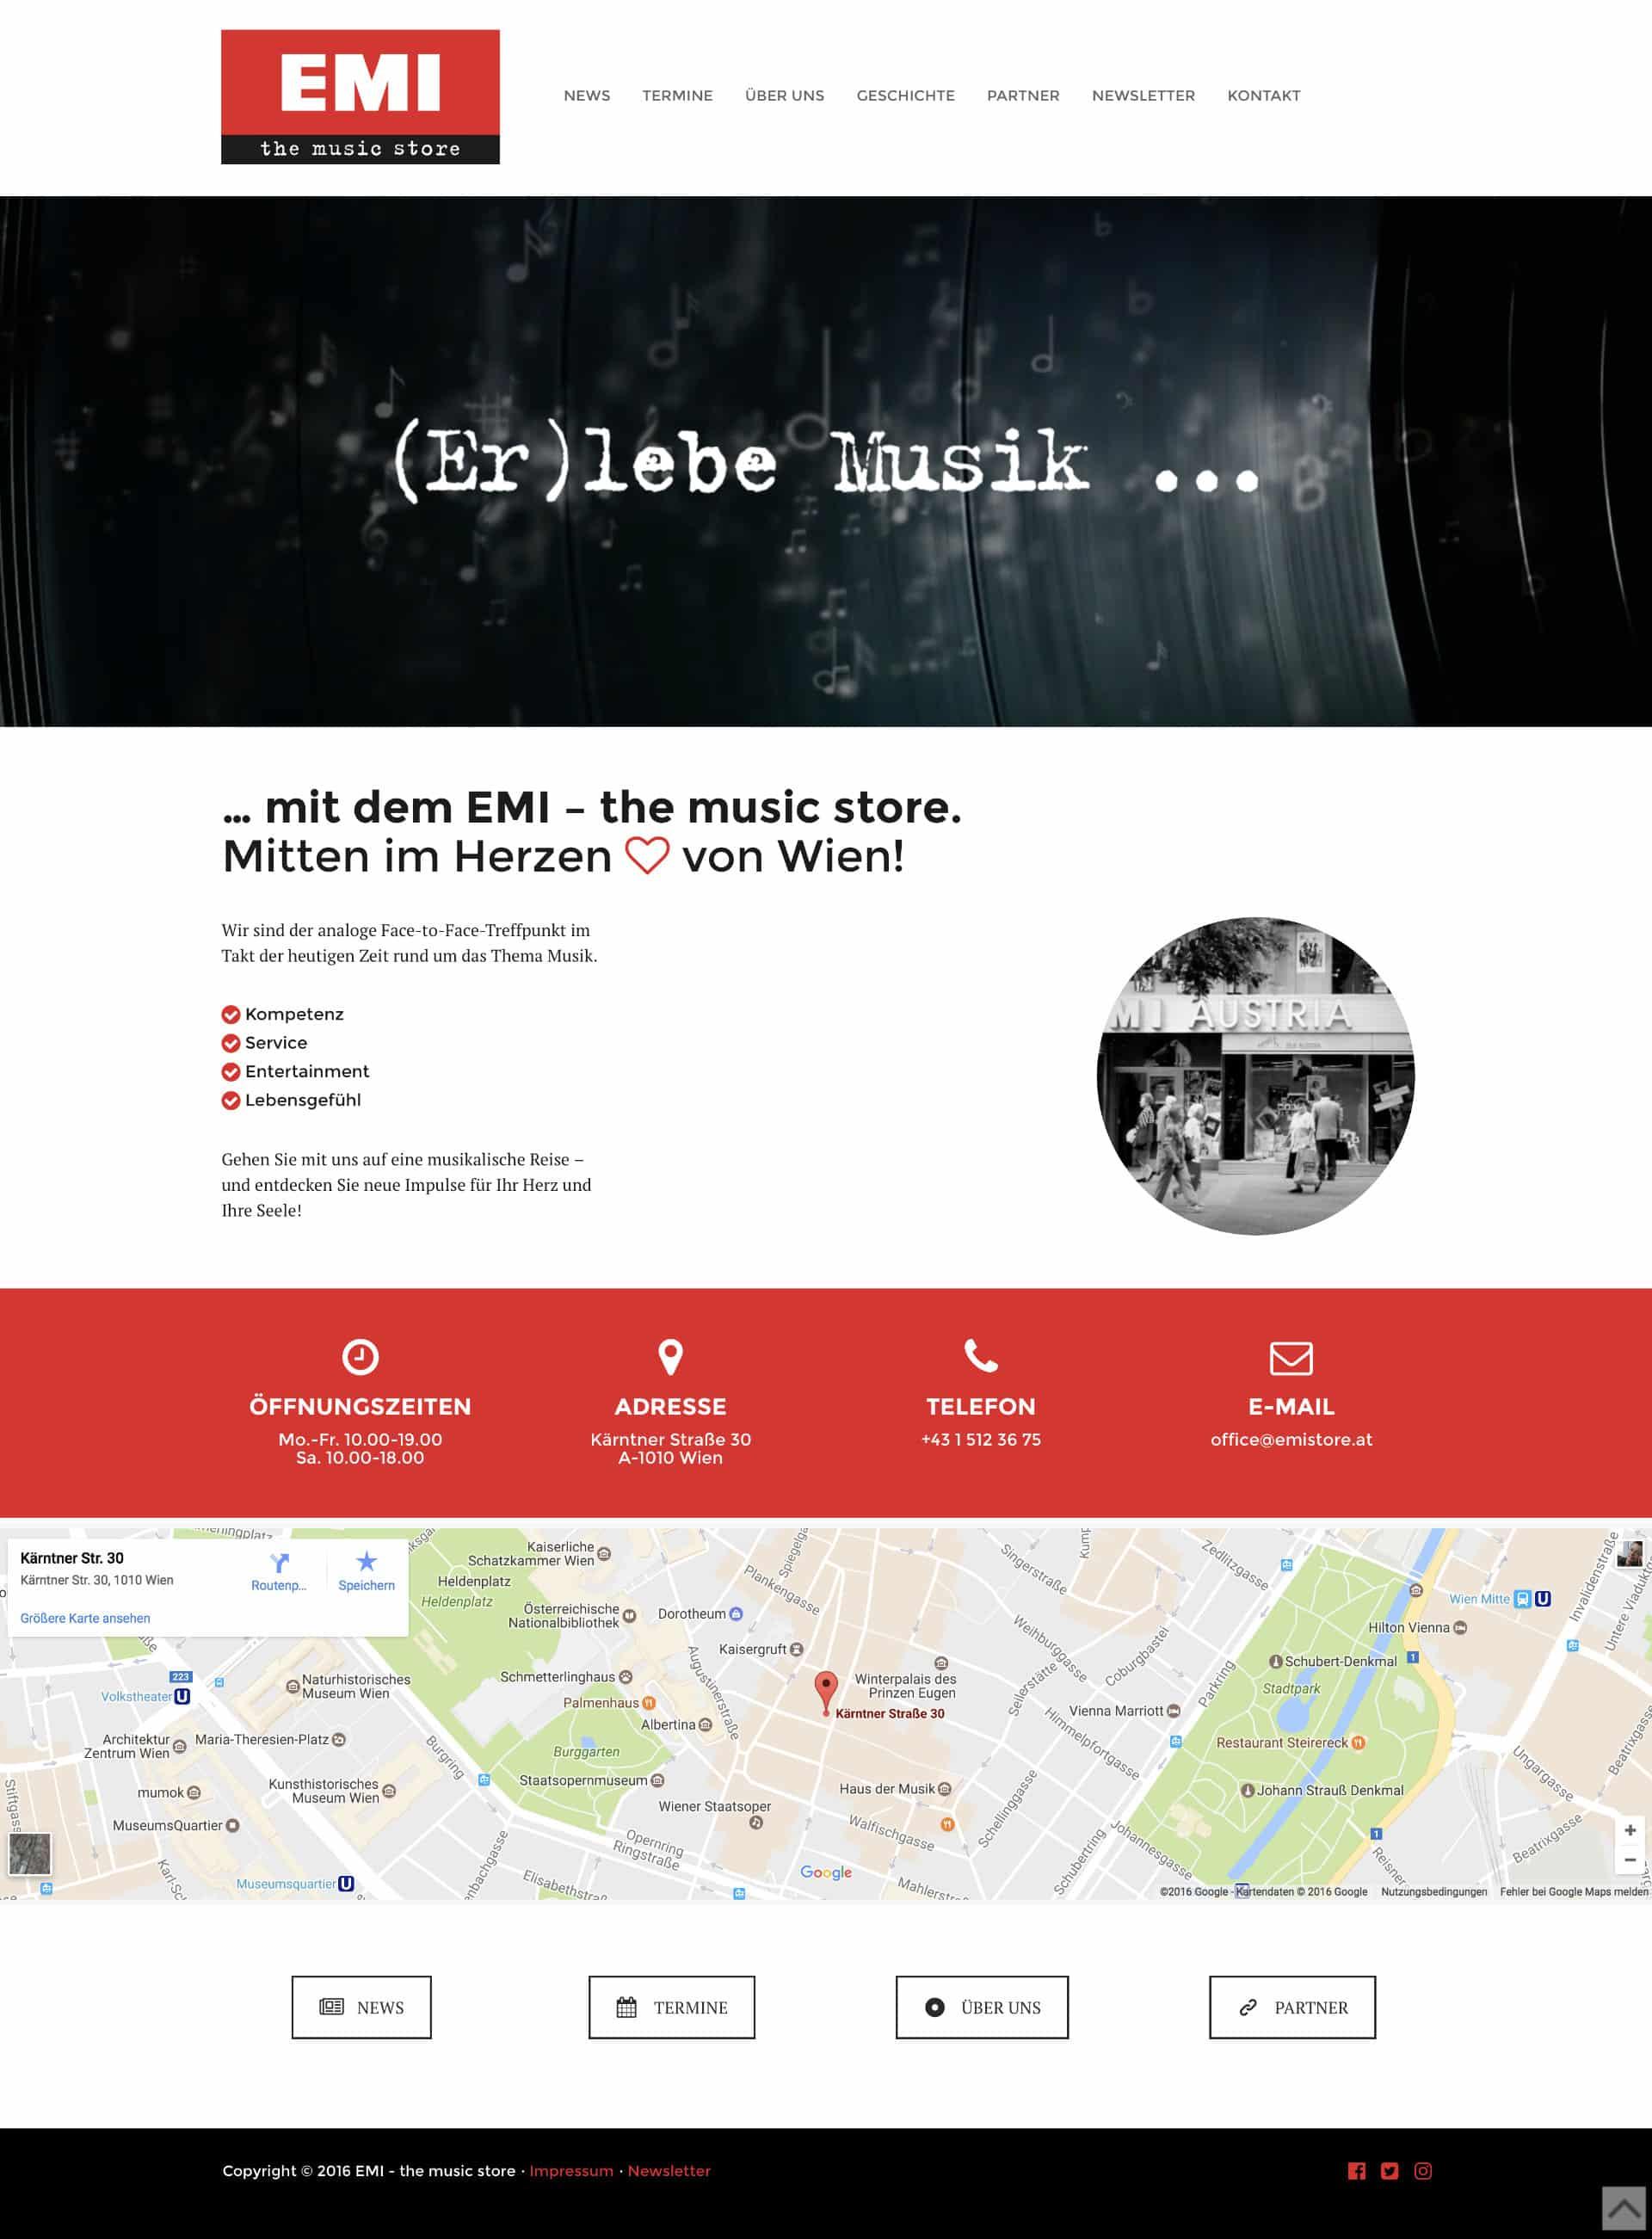 emi music store website